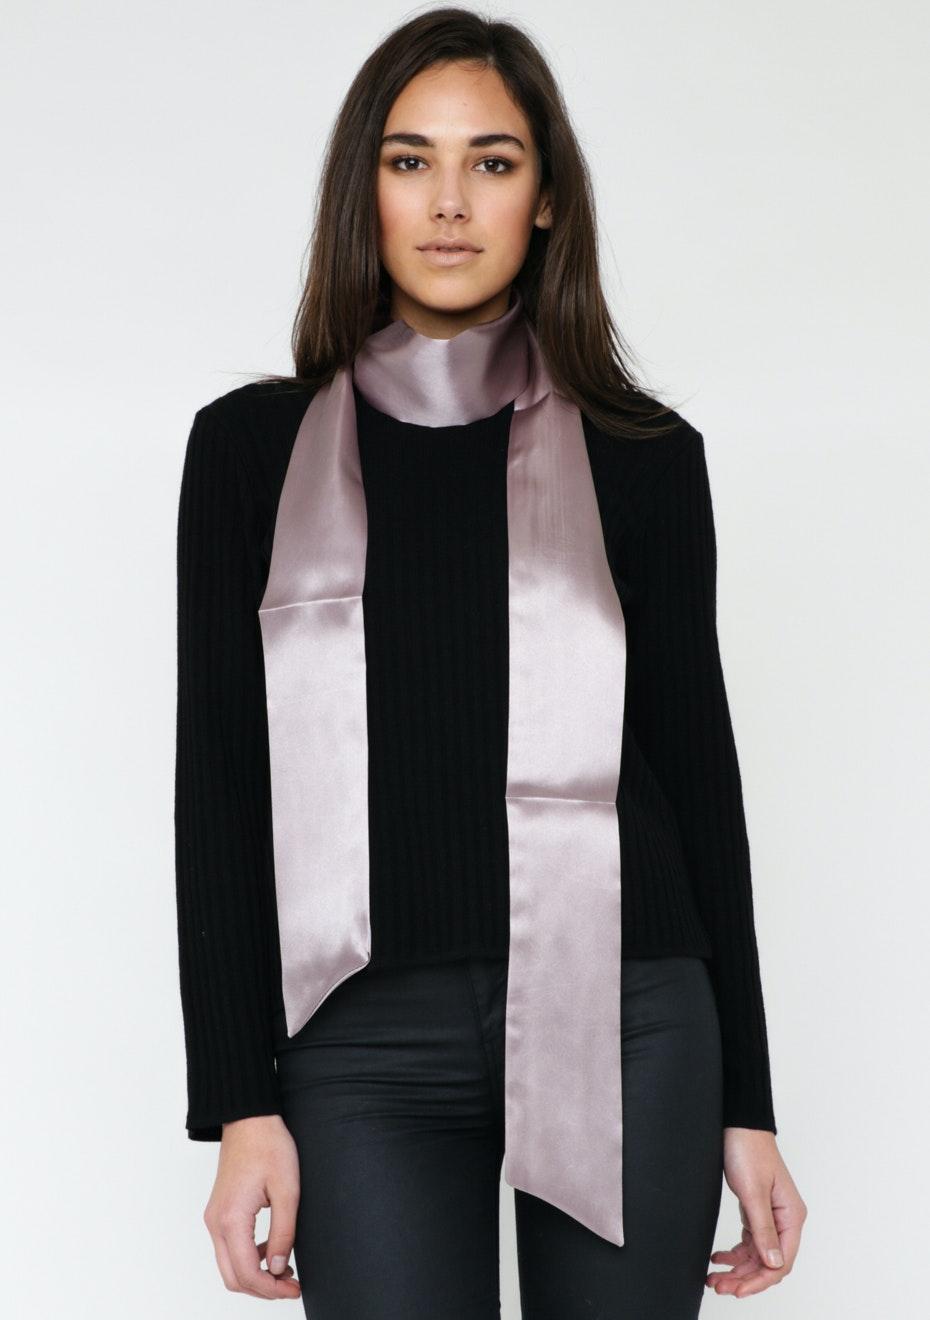 Satin Solid Skinny Tie Scarf - Smoke